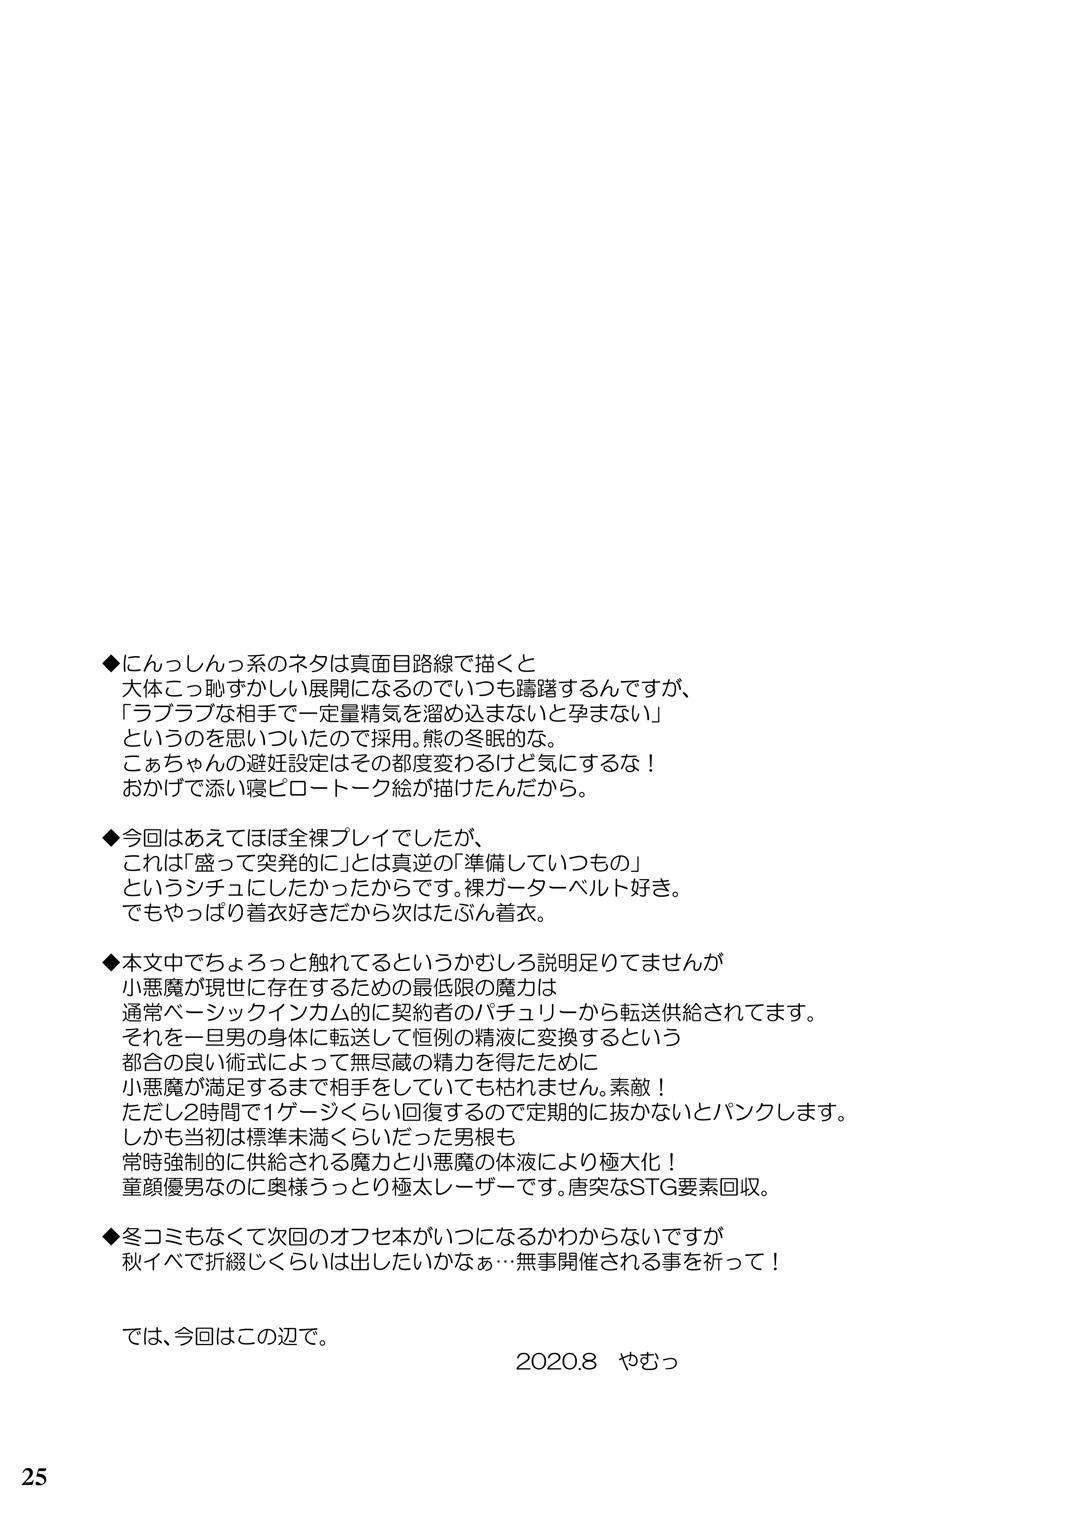 Juusha no Tame no Nocturne 23